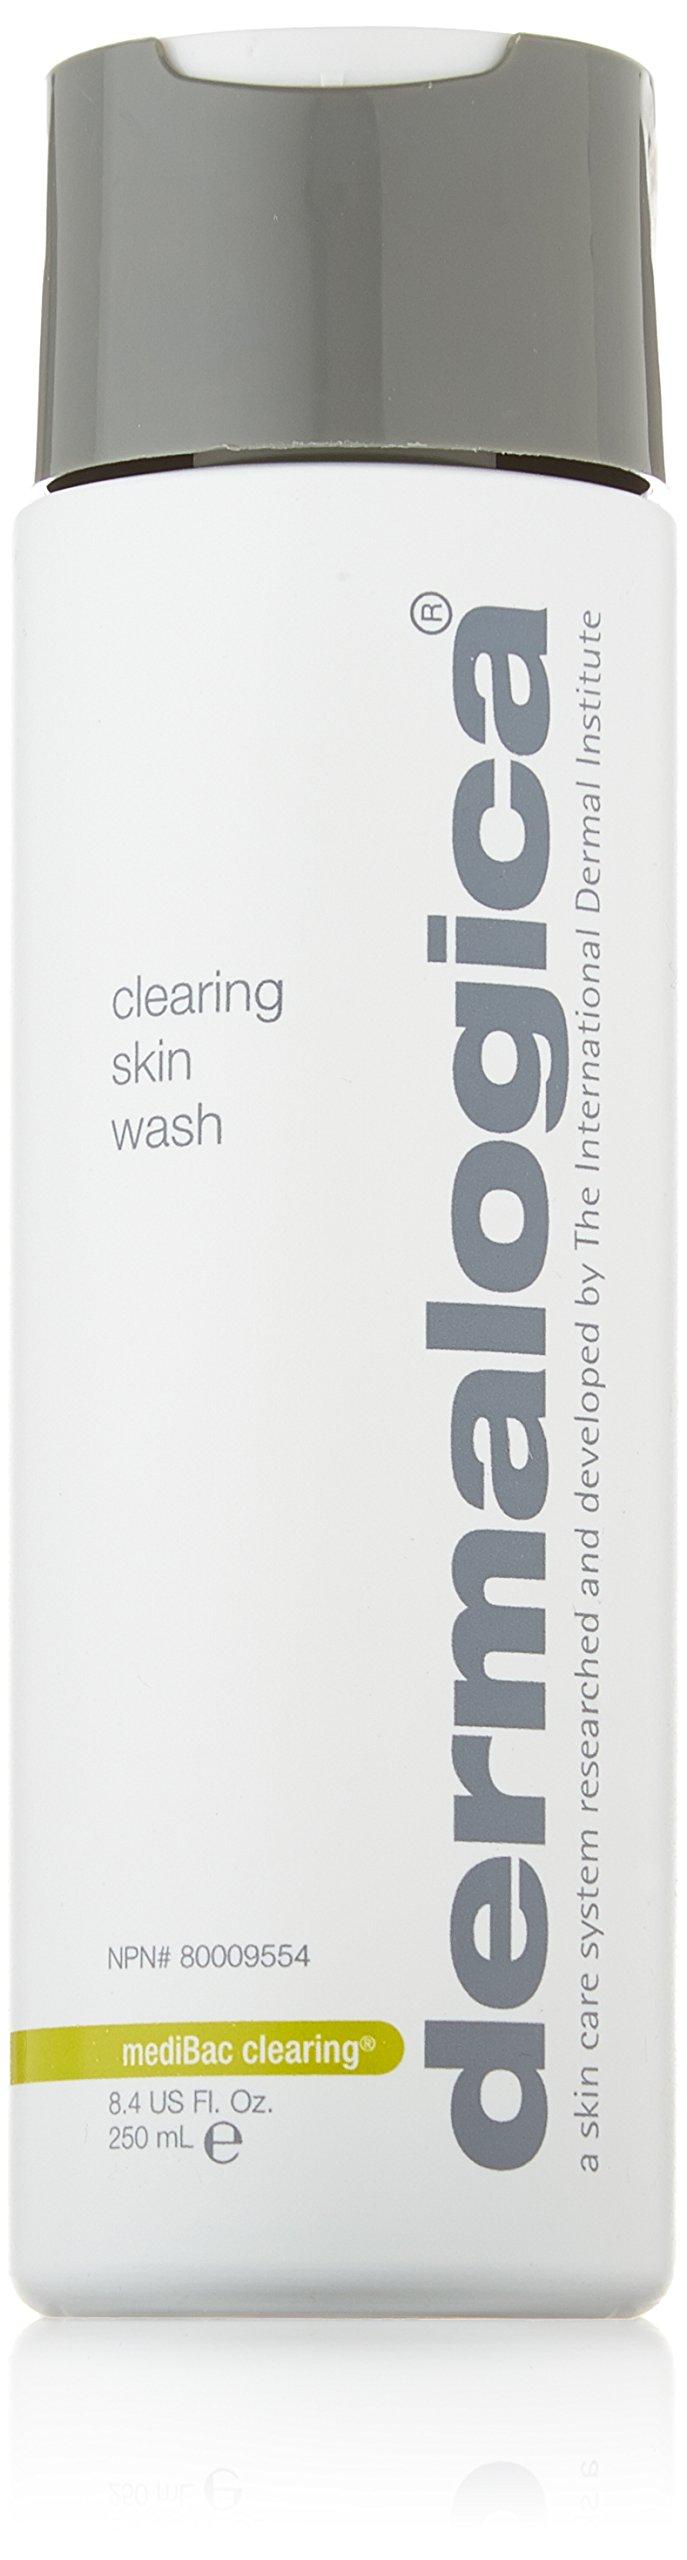 Dermalogica Clearing Skin Wash, 8.4 Fluid Ounce